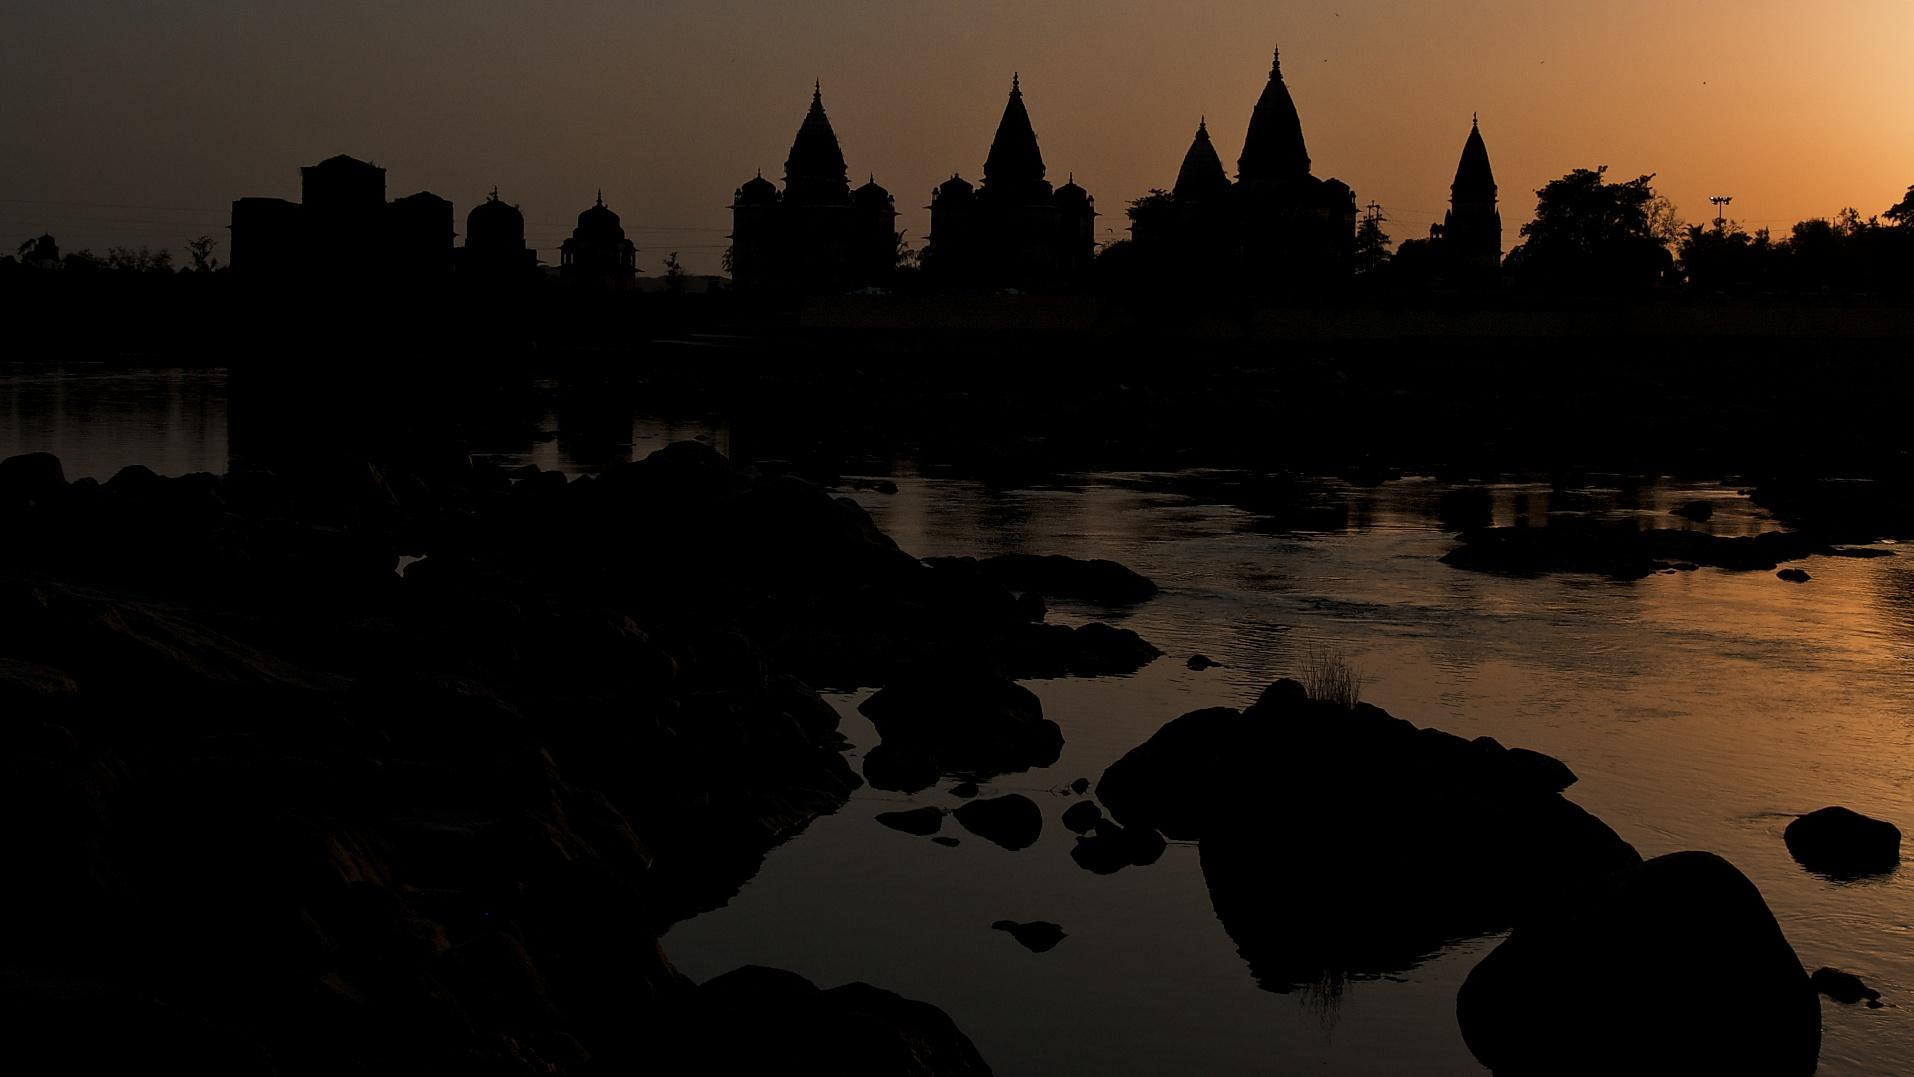 the chhatris at sunset